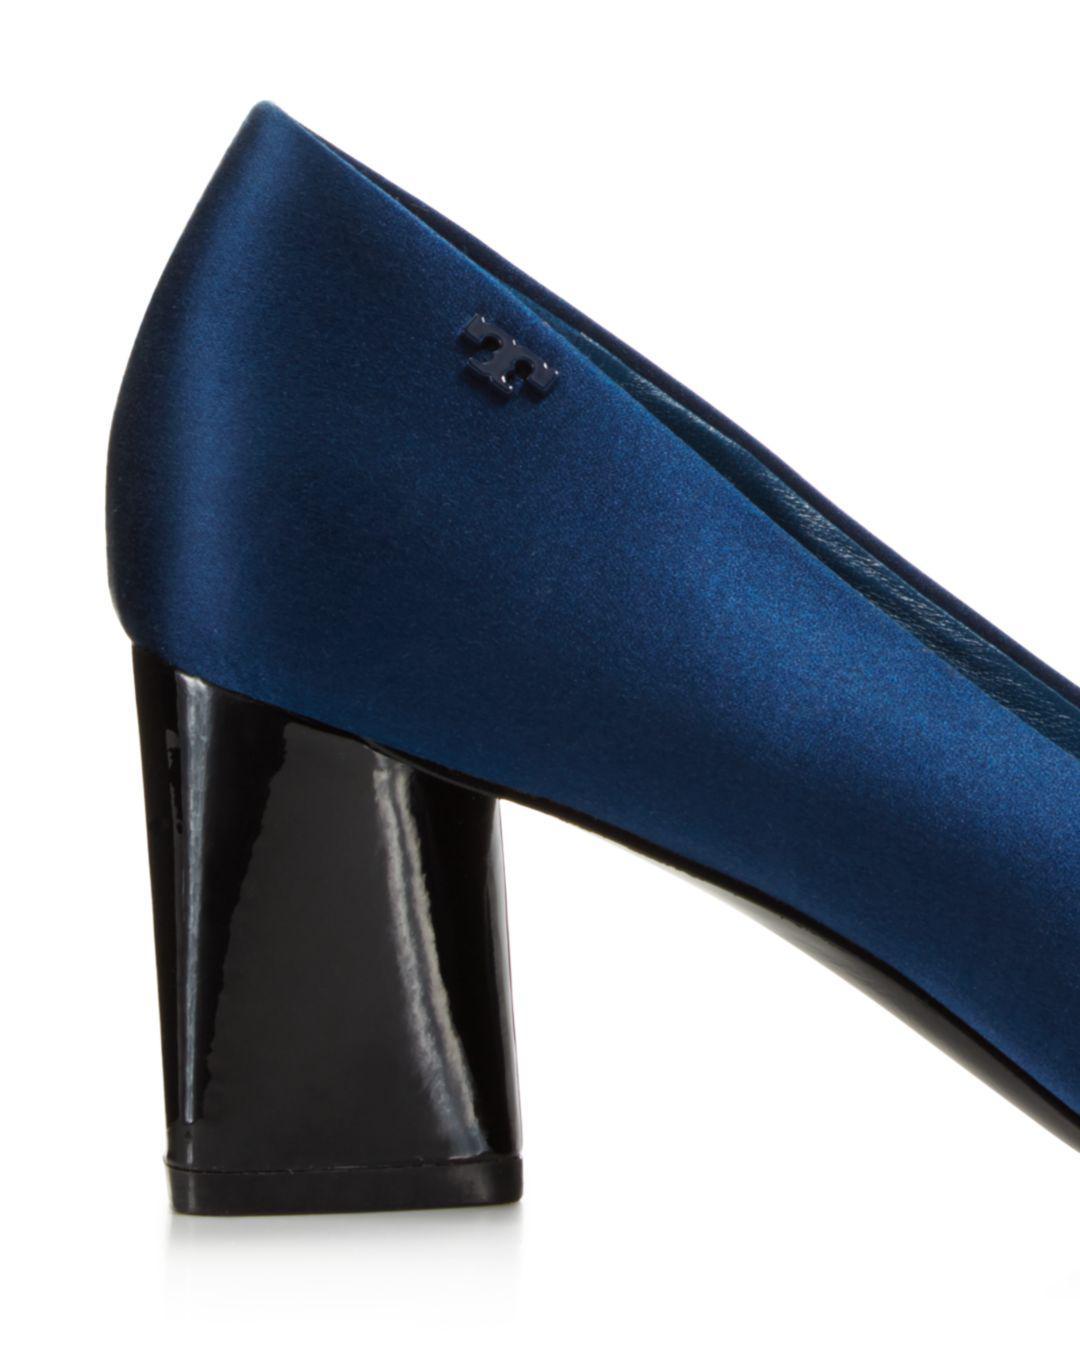 638d33db38d Lyst - Tory Burch Women s Viola Satin Bow High-heel Pumps in Blue